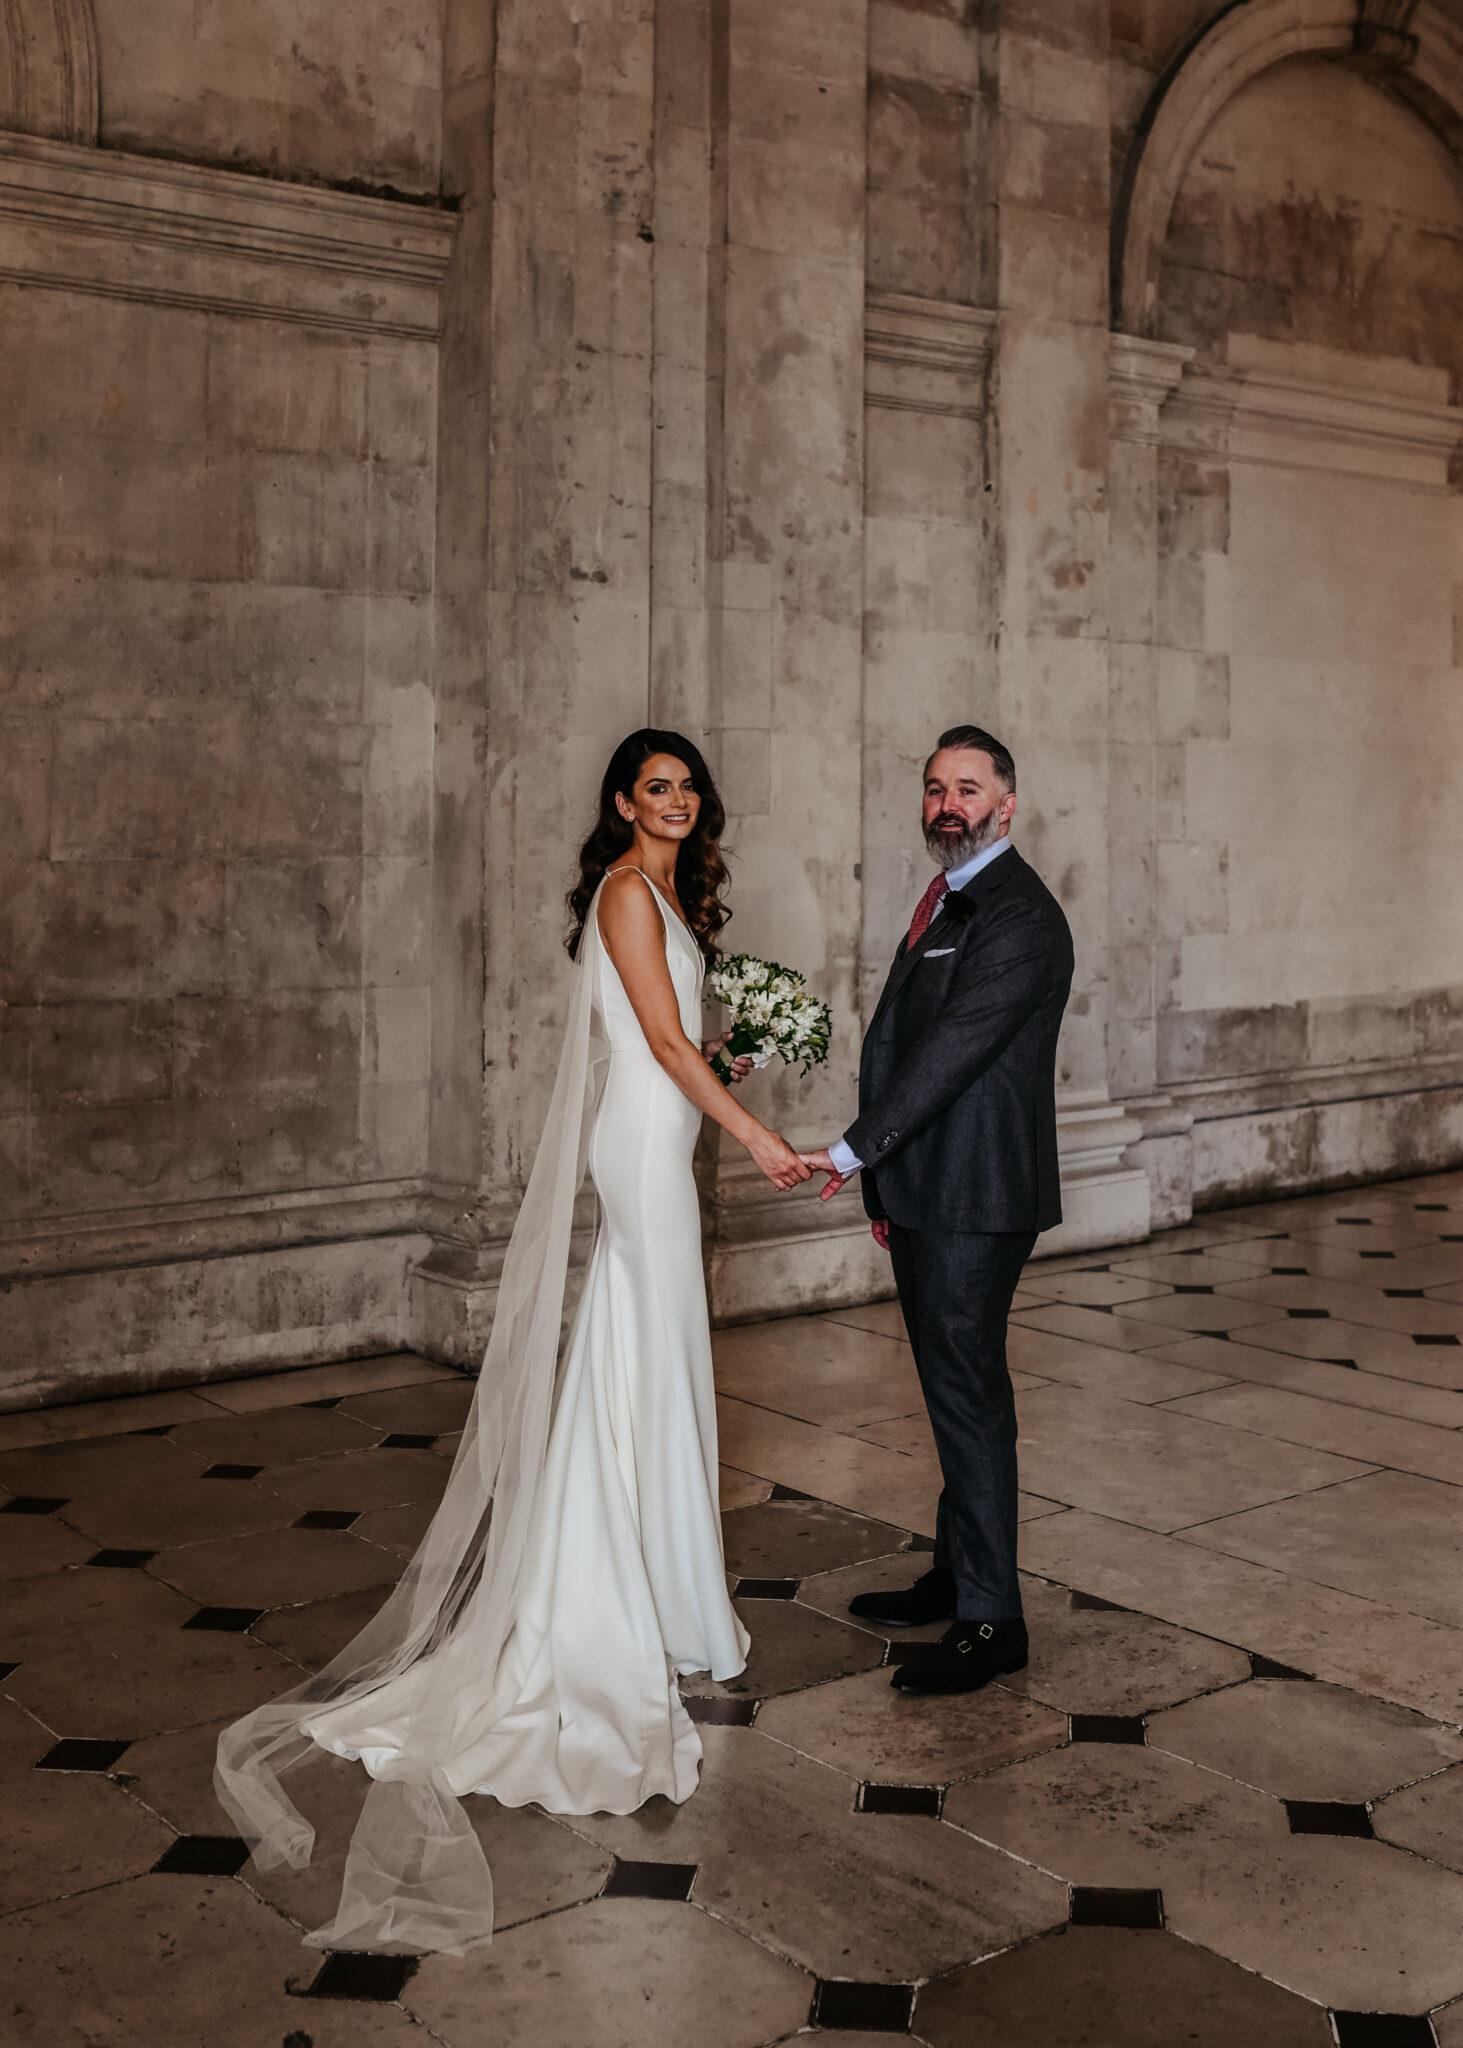 City Hall Wedding Photos Intercontinental Hotel Dublin 26